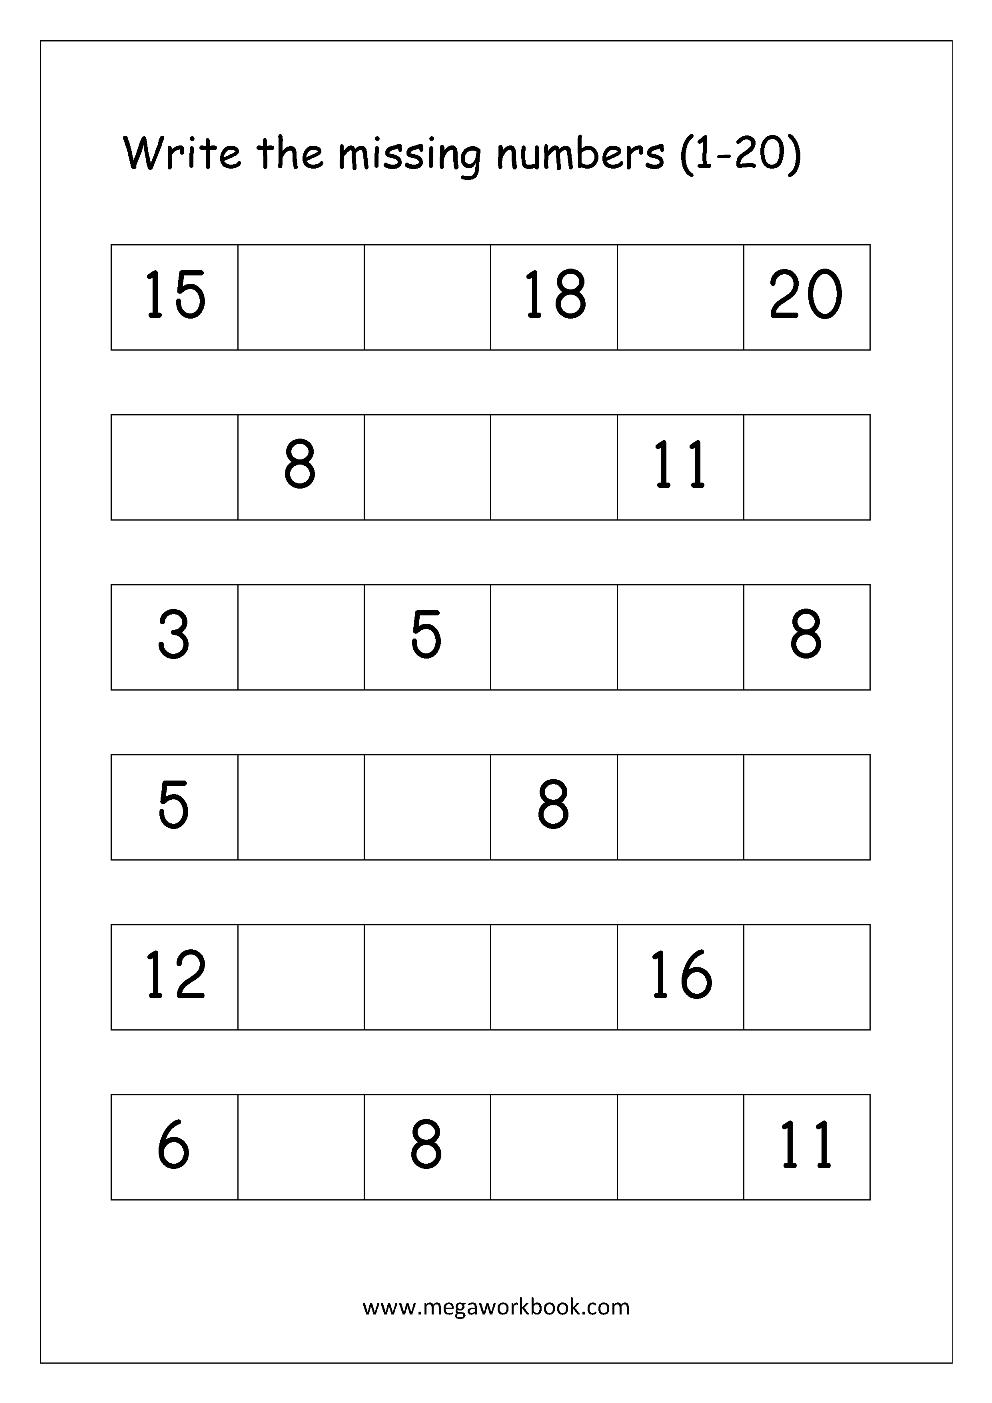 Ordering Numbers Worksheets, Missing Numbers, What Comes Before And - Free Printable Numbers 1 20 Worksheets